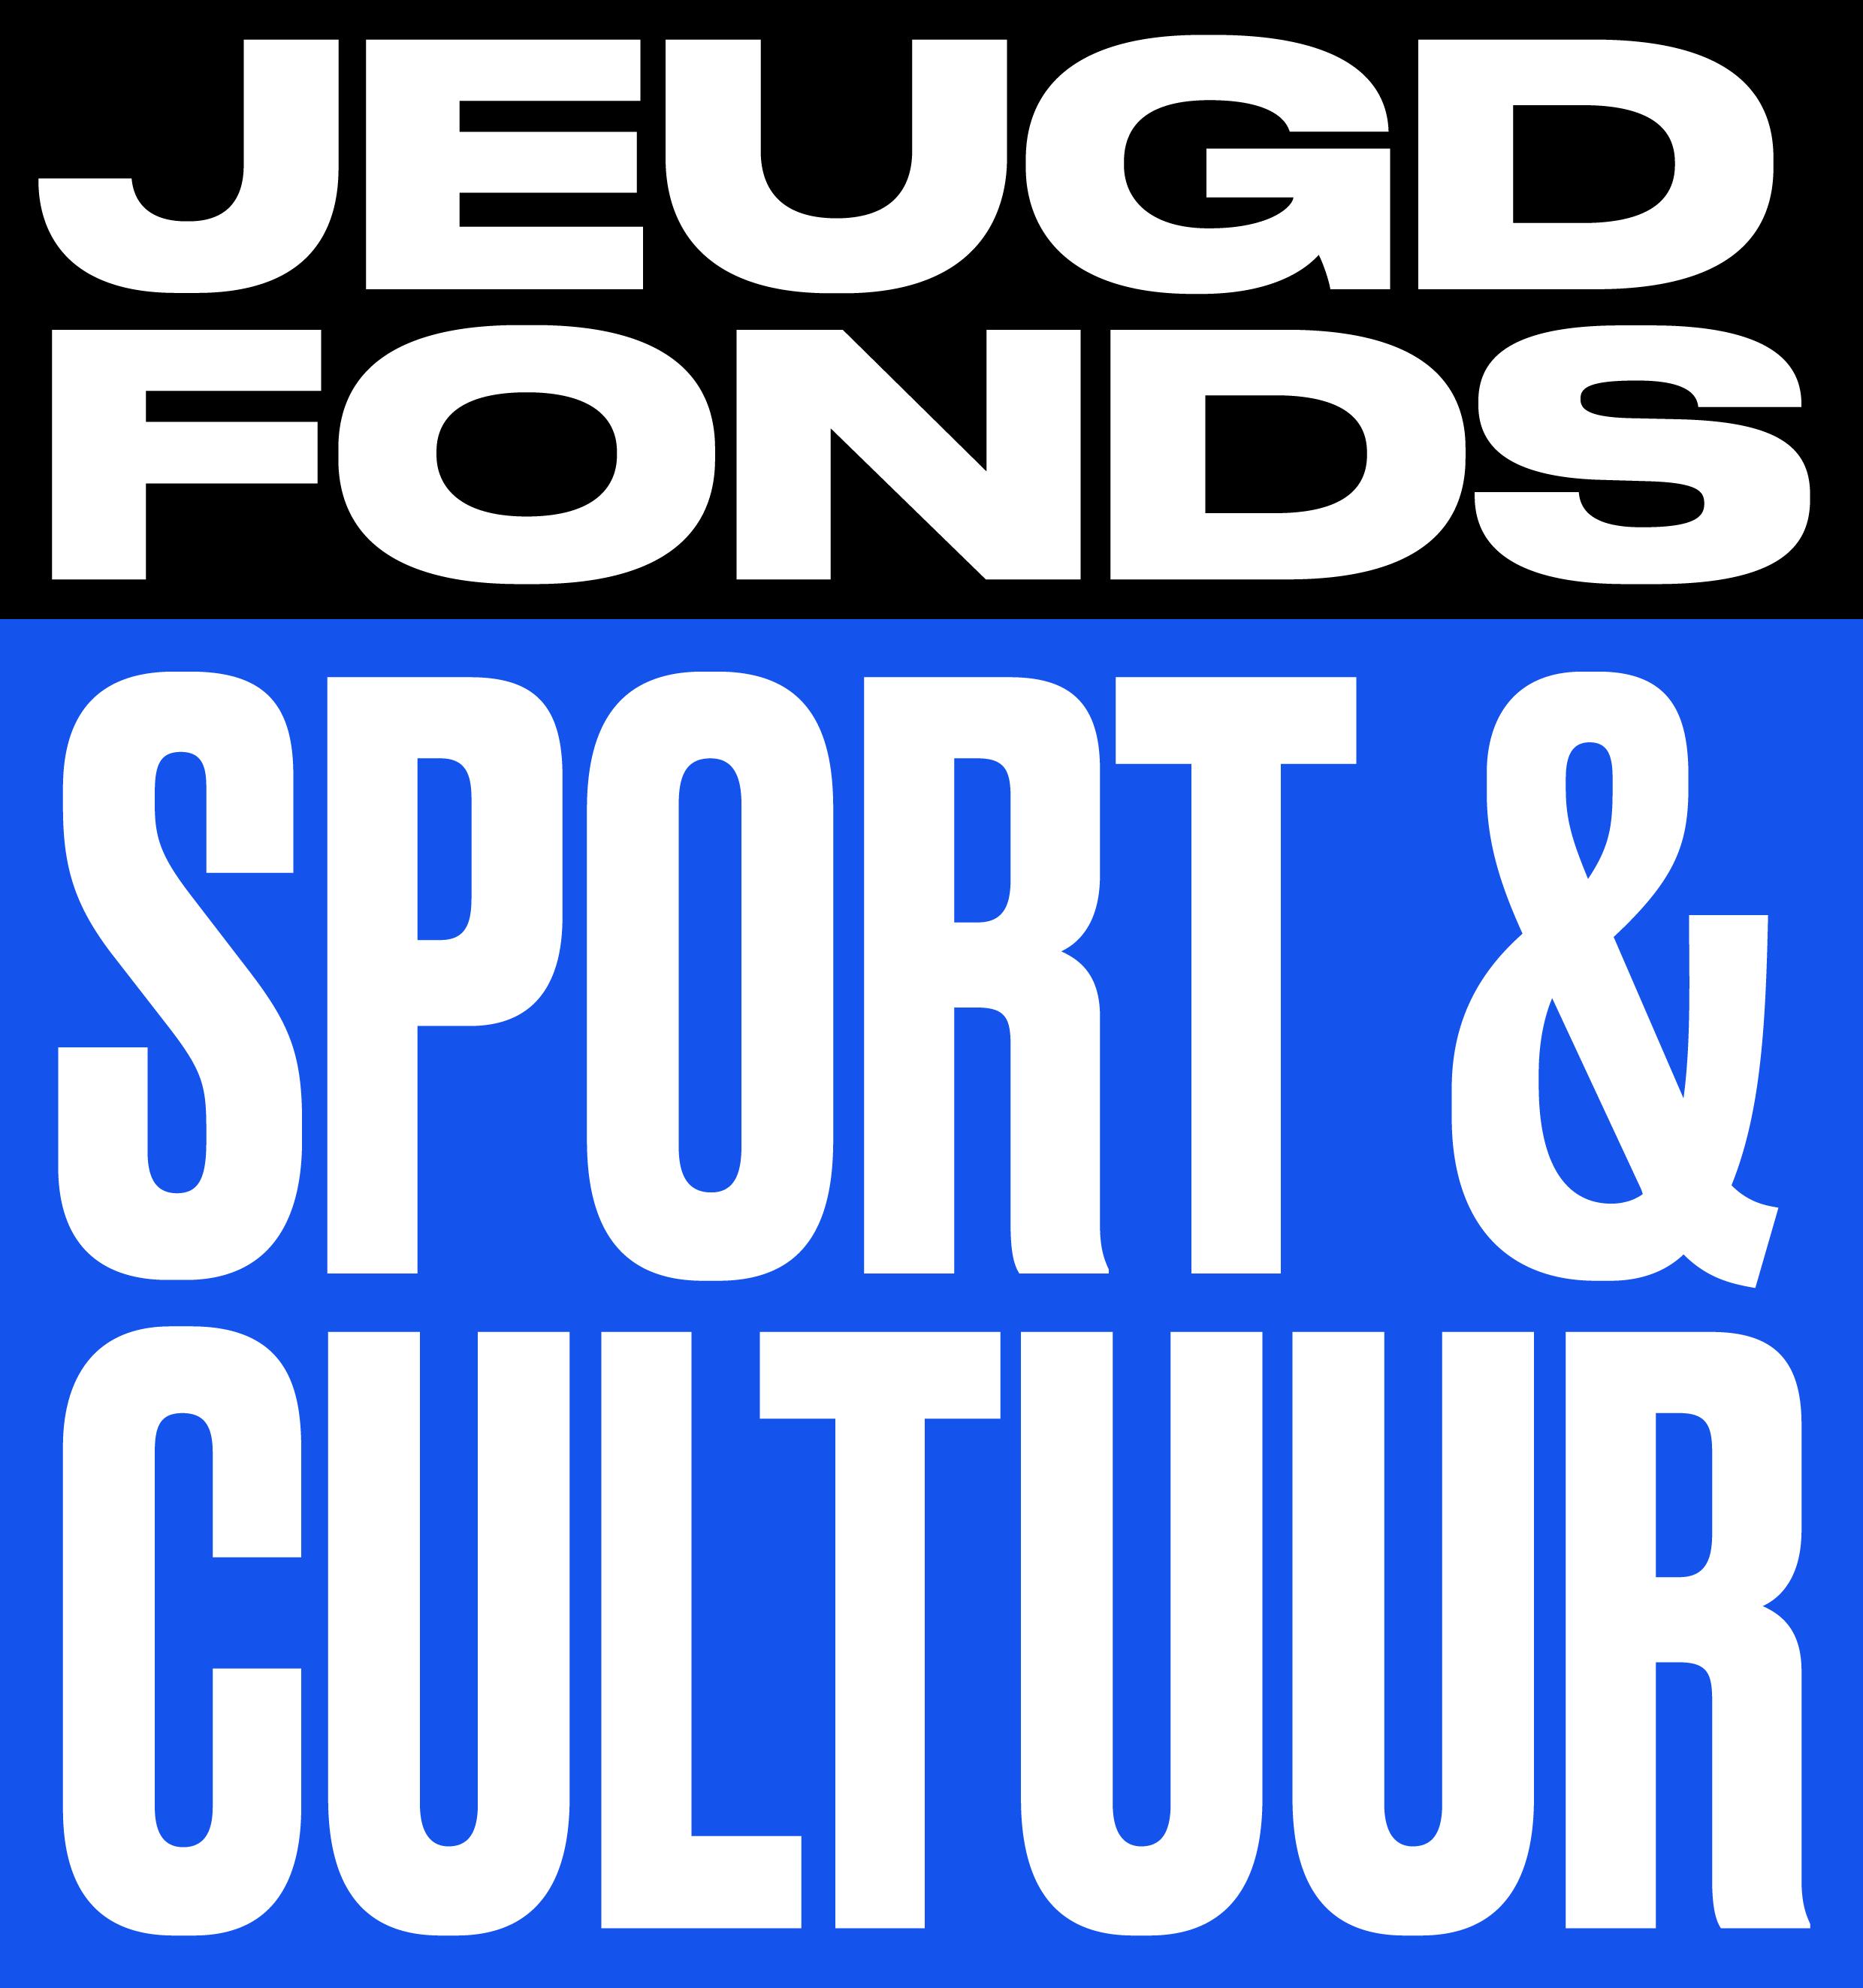 Logo Jeugdfonds Sport en Cultuur Drenthe